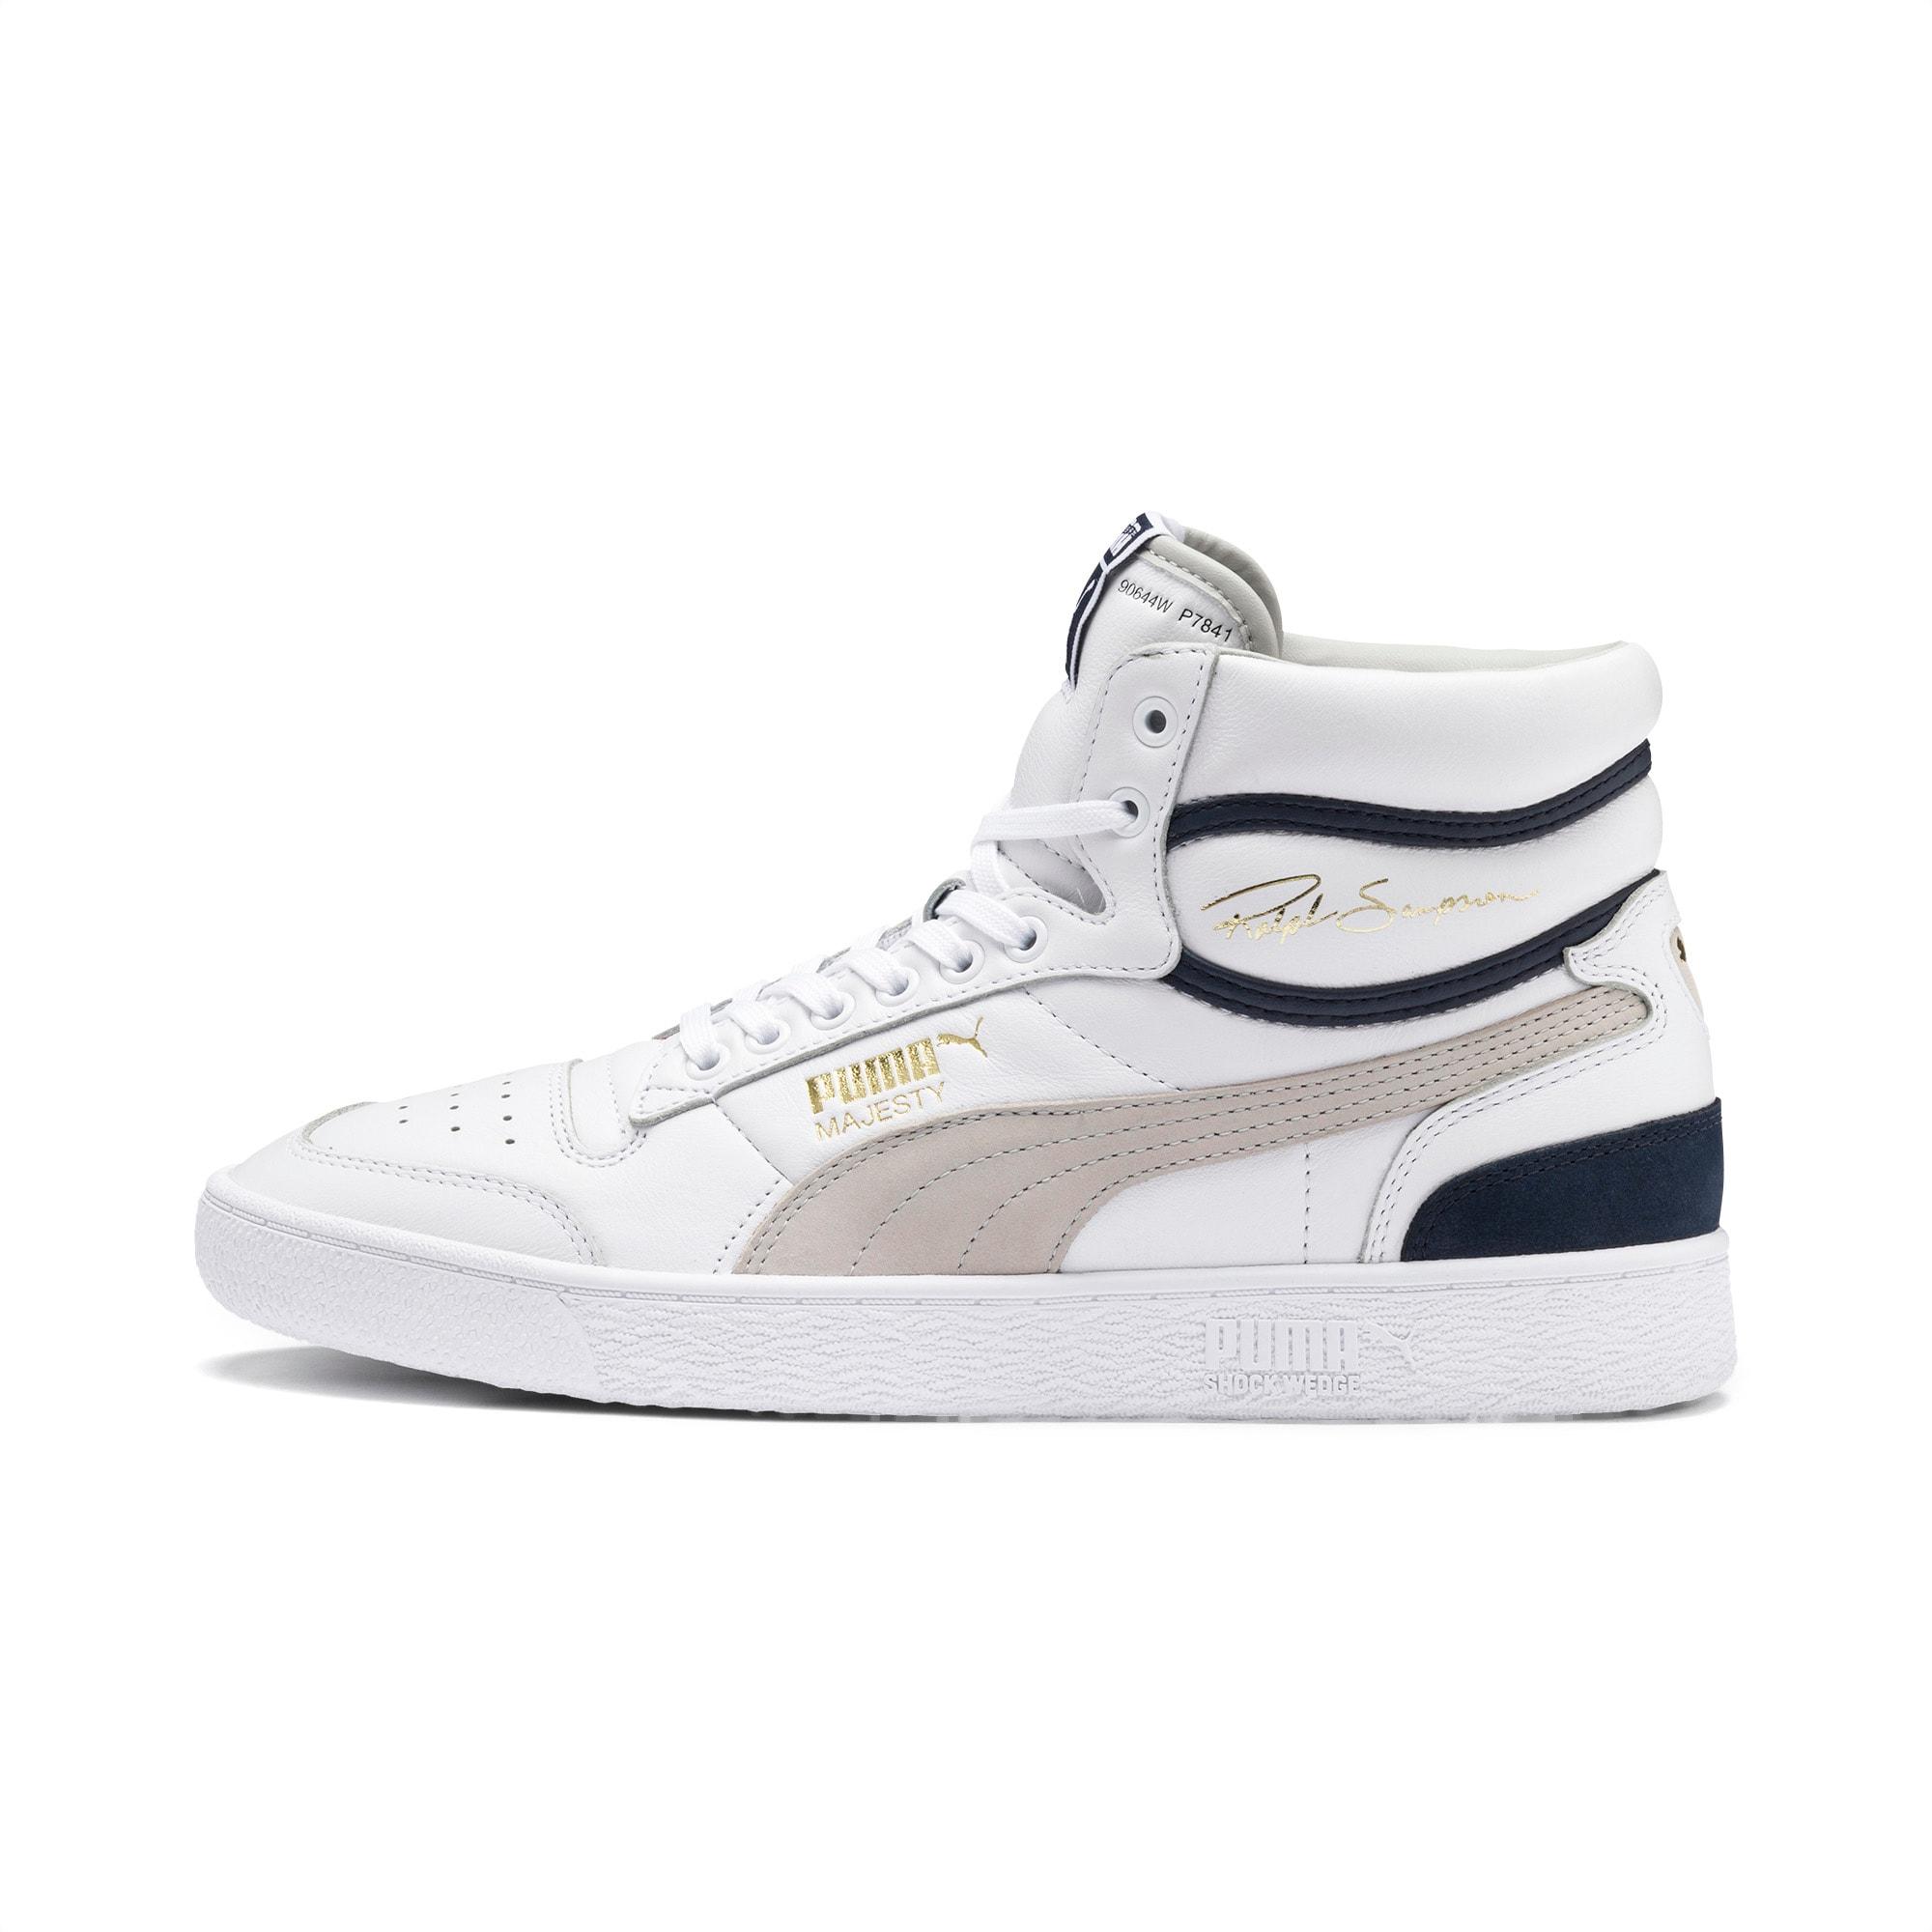 chaussure basket ralph sampson mid og, blanc/bleu/gris, taille 47, chaussures